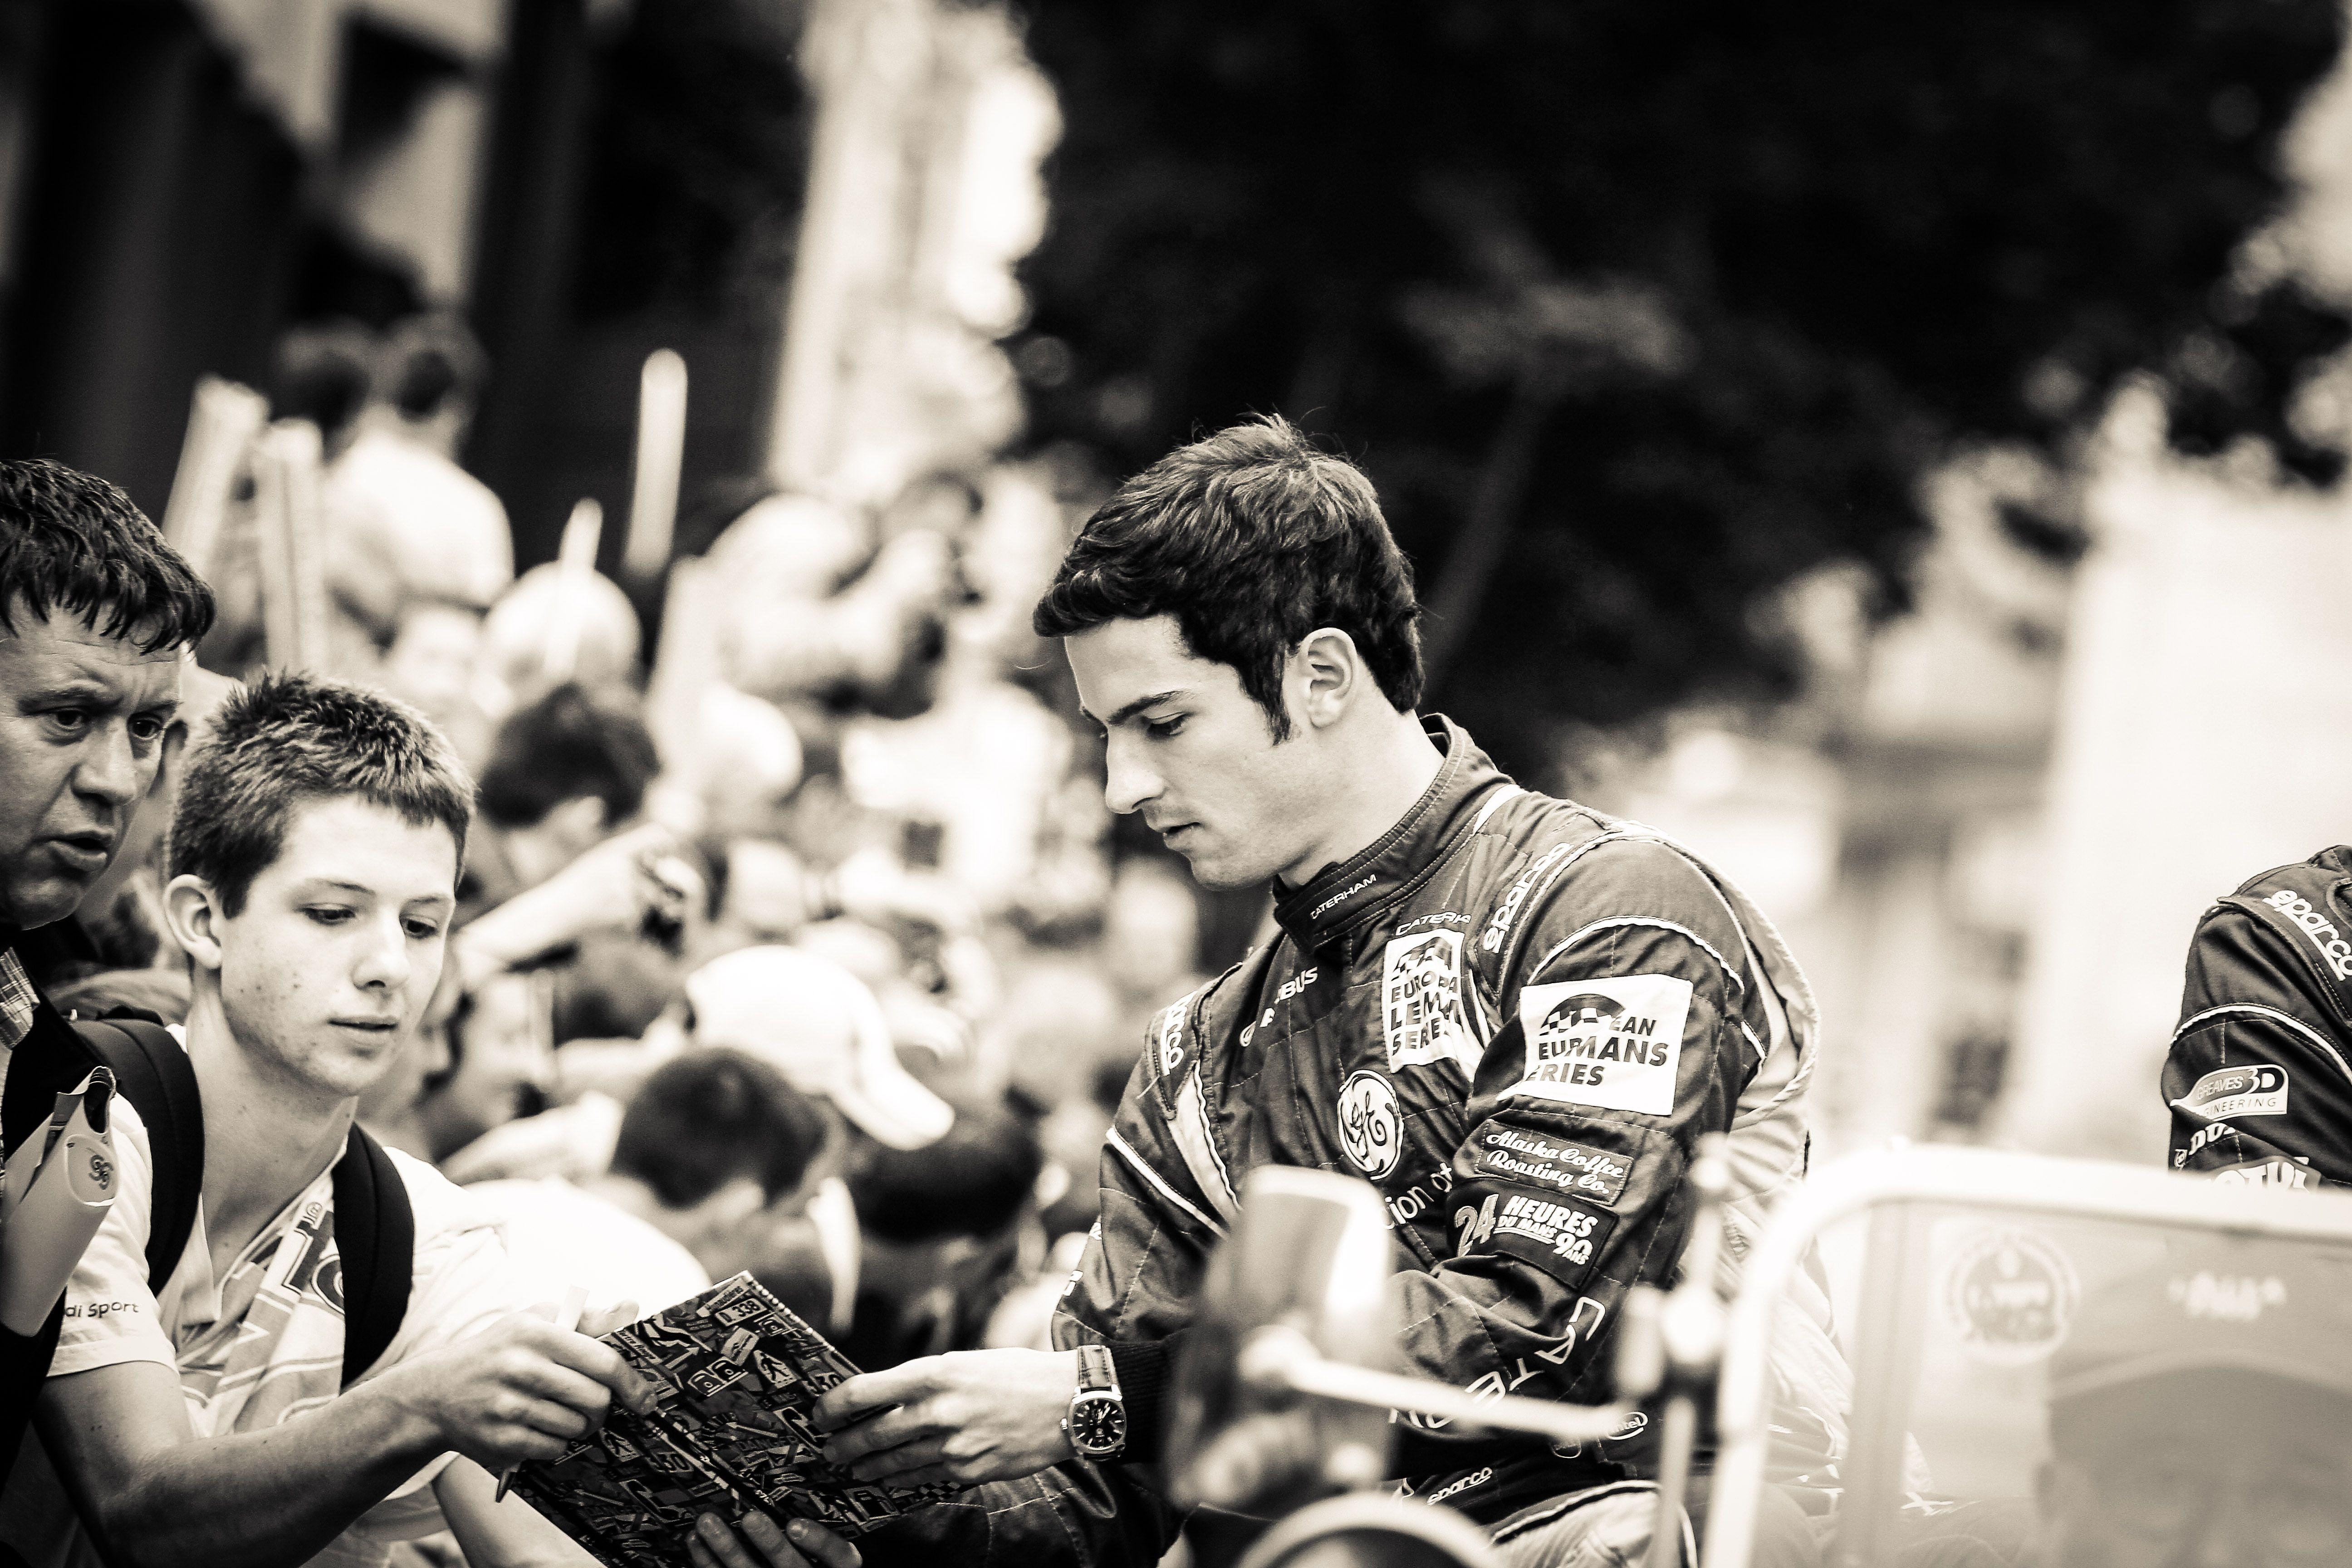 Signing autographs pre race